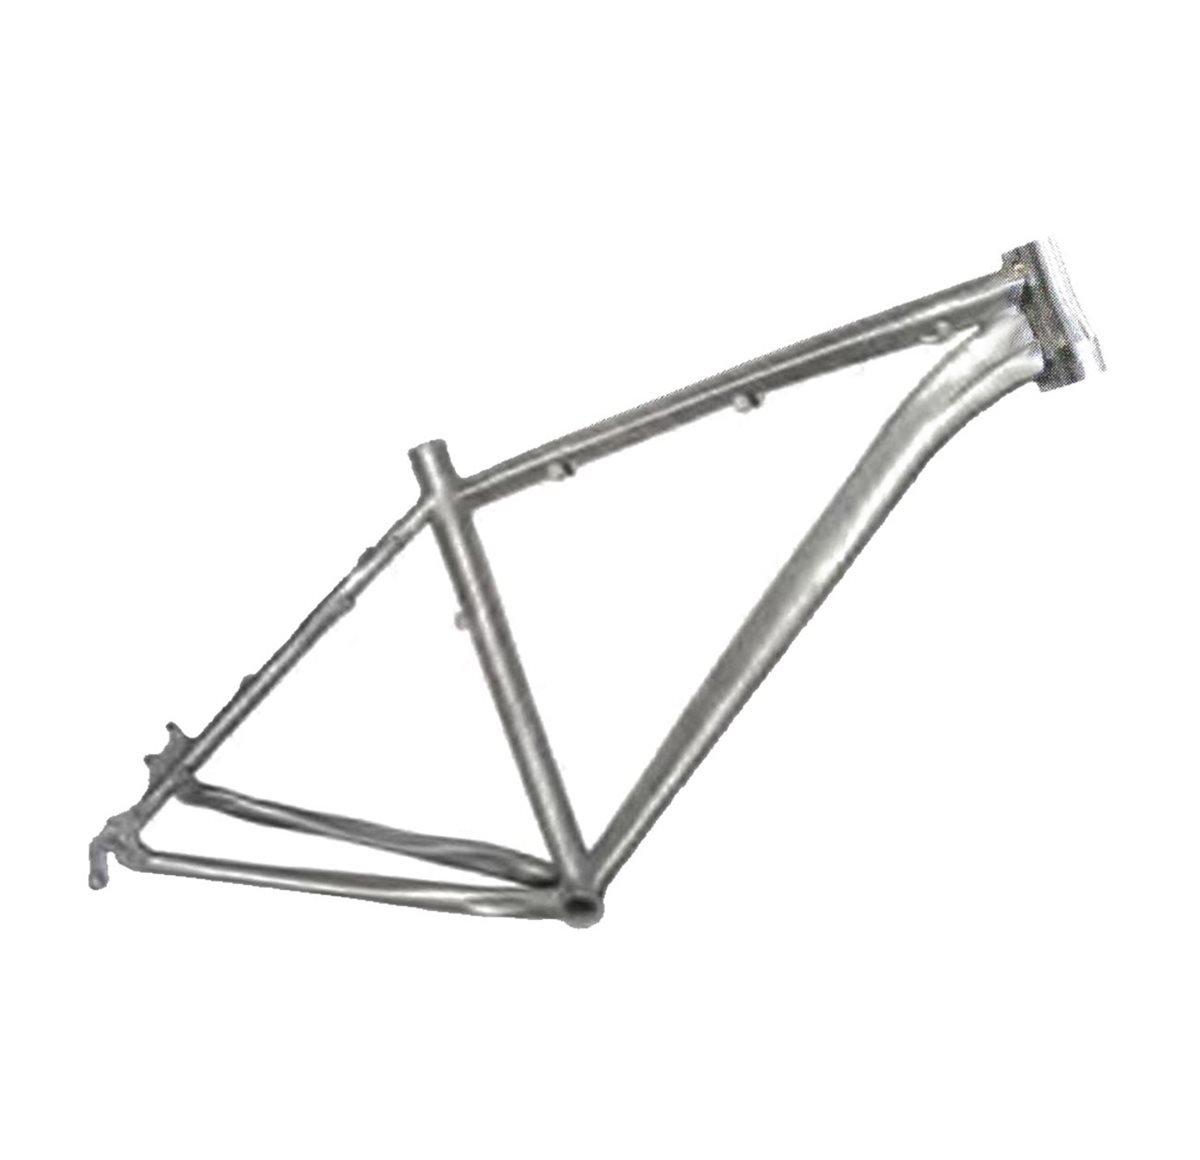 "& 039;Ridewill Bike Rahmen MTB 27,5 ""konisch 1 – 1 8"" – 1,5 ""Größe 43 Disco Is Alu roh (MTB) MTB Frame 27,5 Zoll TapeROT 1 – 1 8"" – 1,5 Größe 43 is Disc RAW Alloy (MTB)"